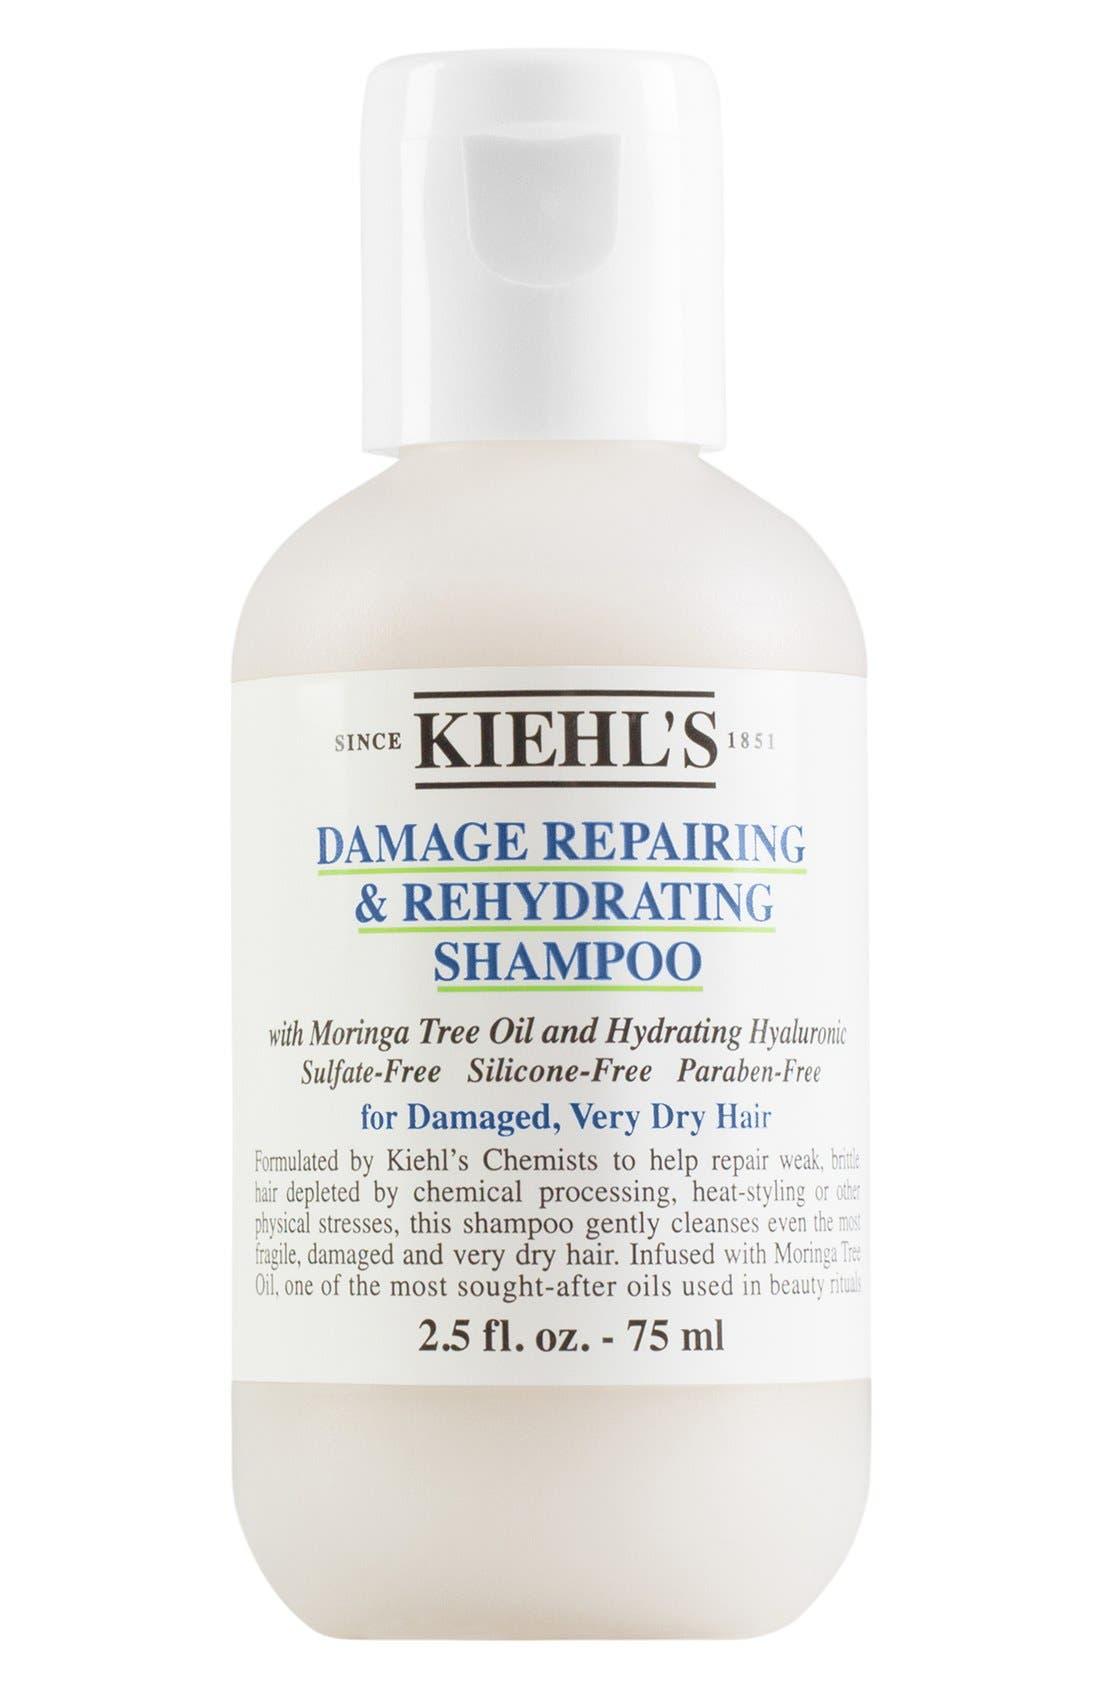 Kiehl's Since 1851 Damage Repairing & Rehydrating Shampoo